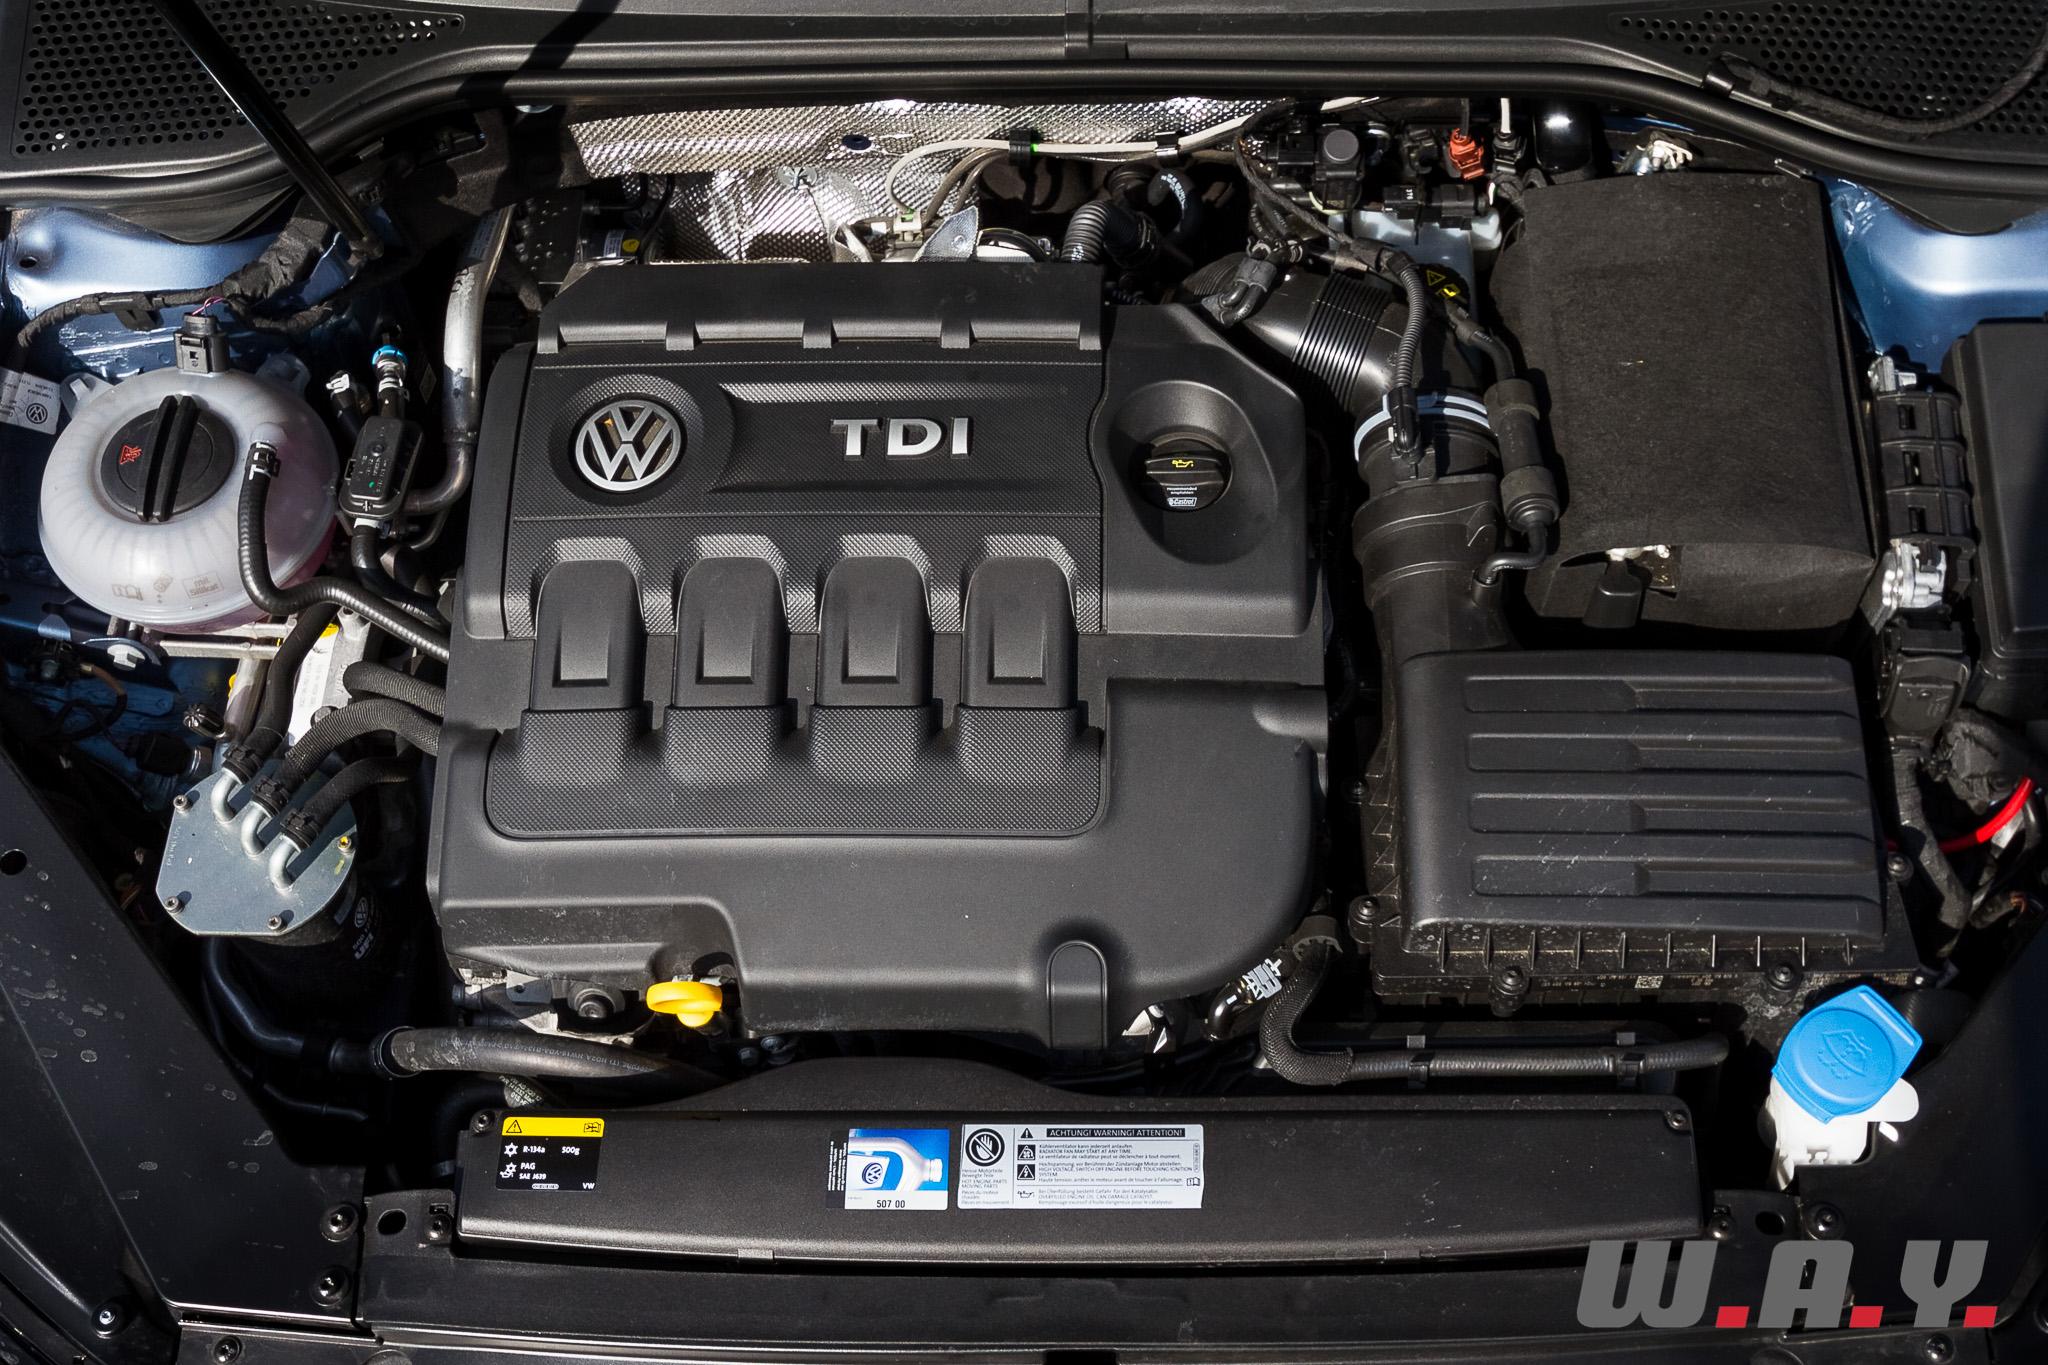 VW-Passat-05